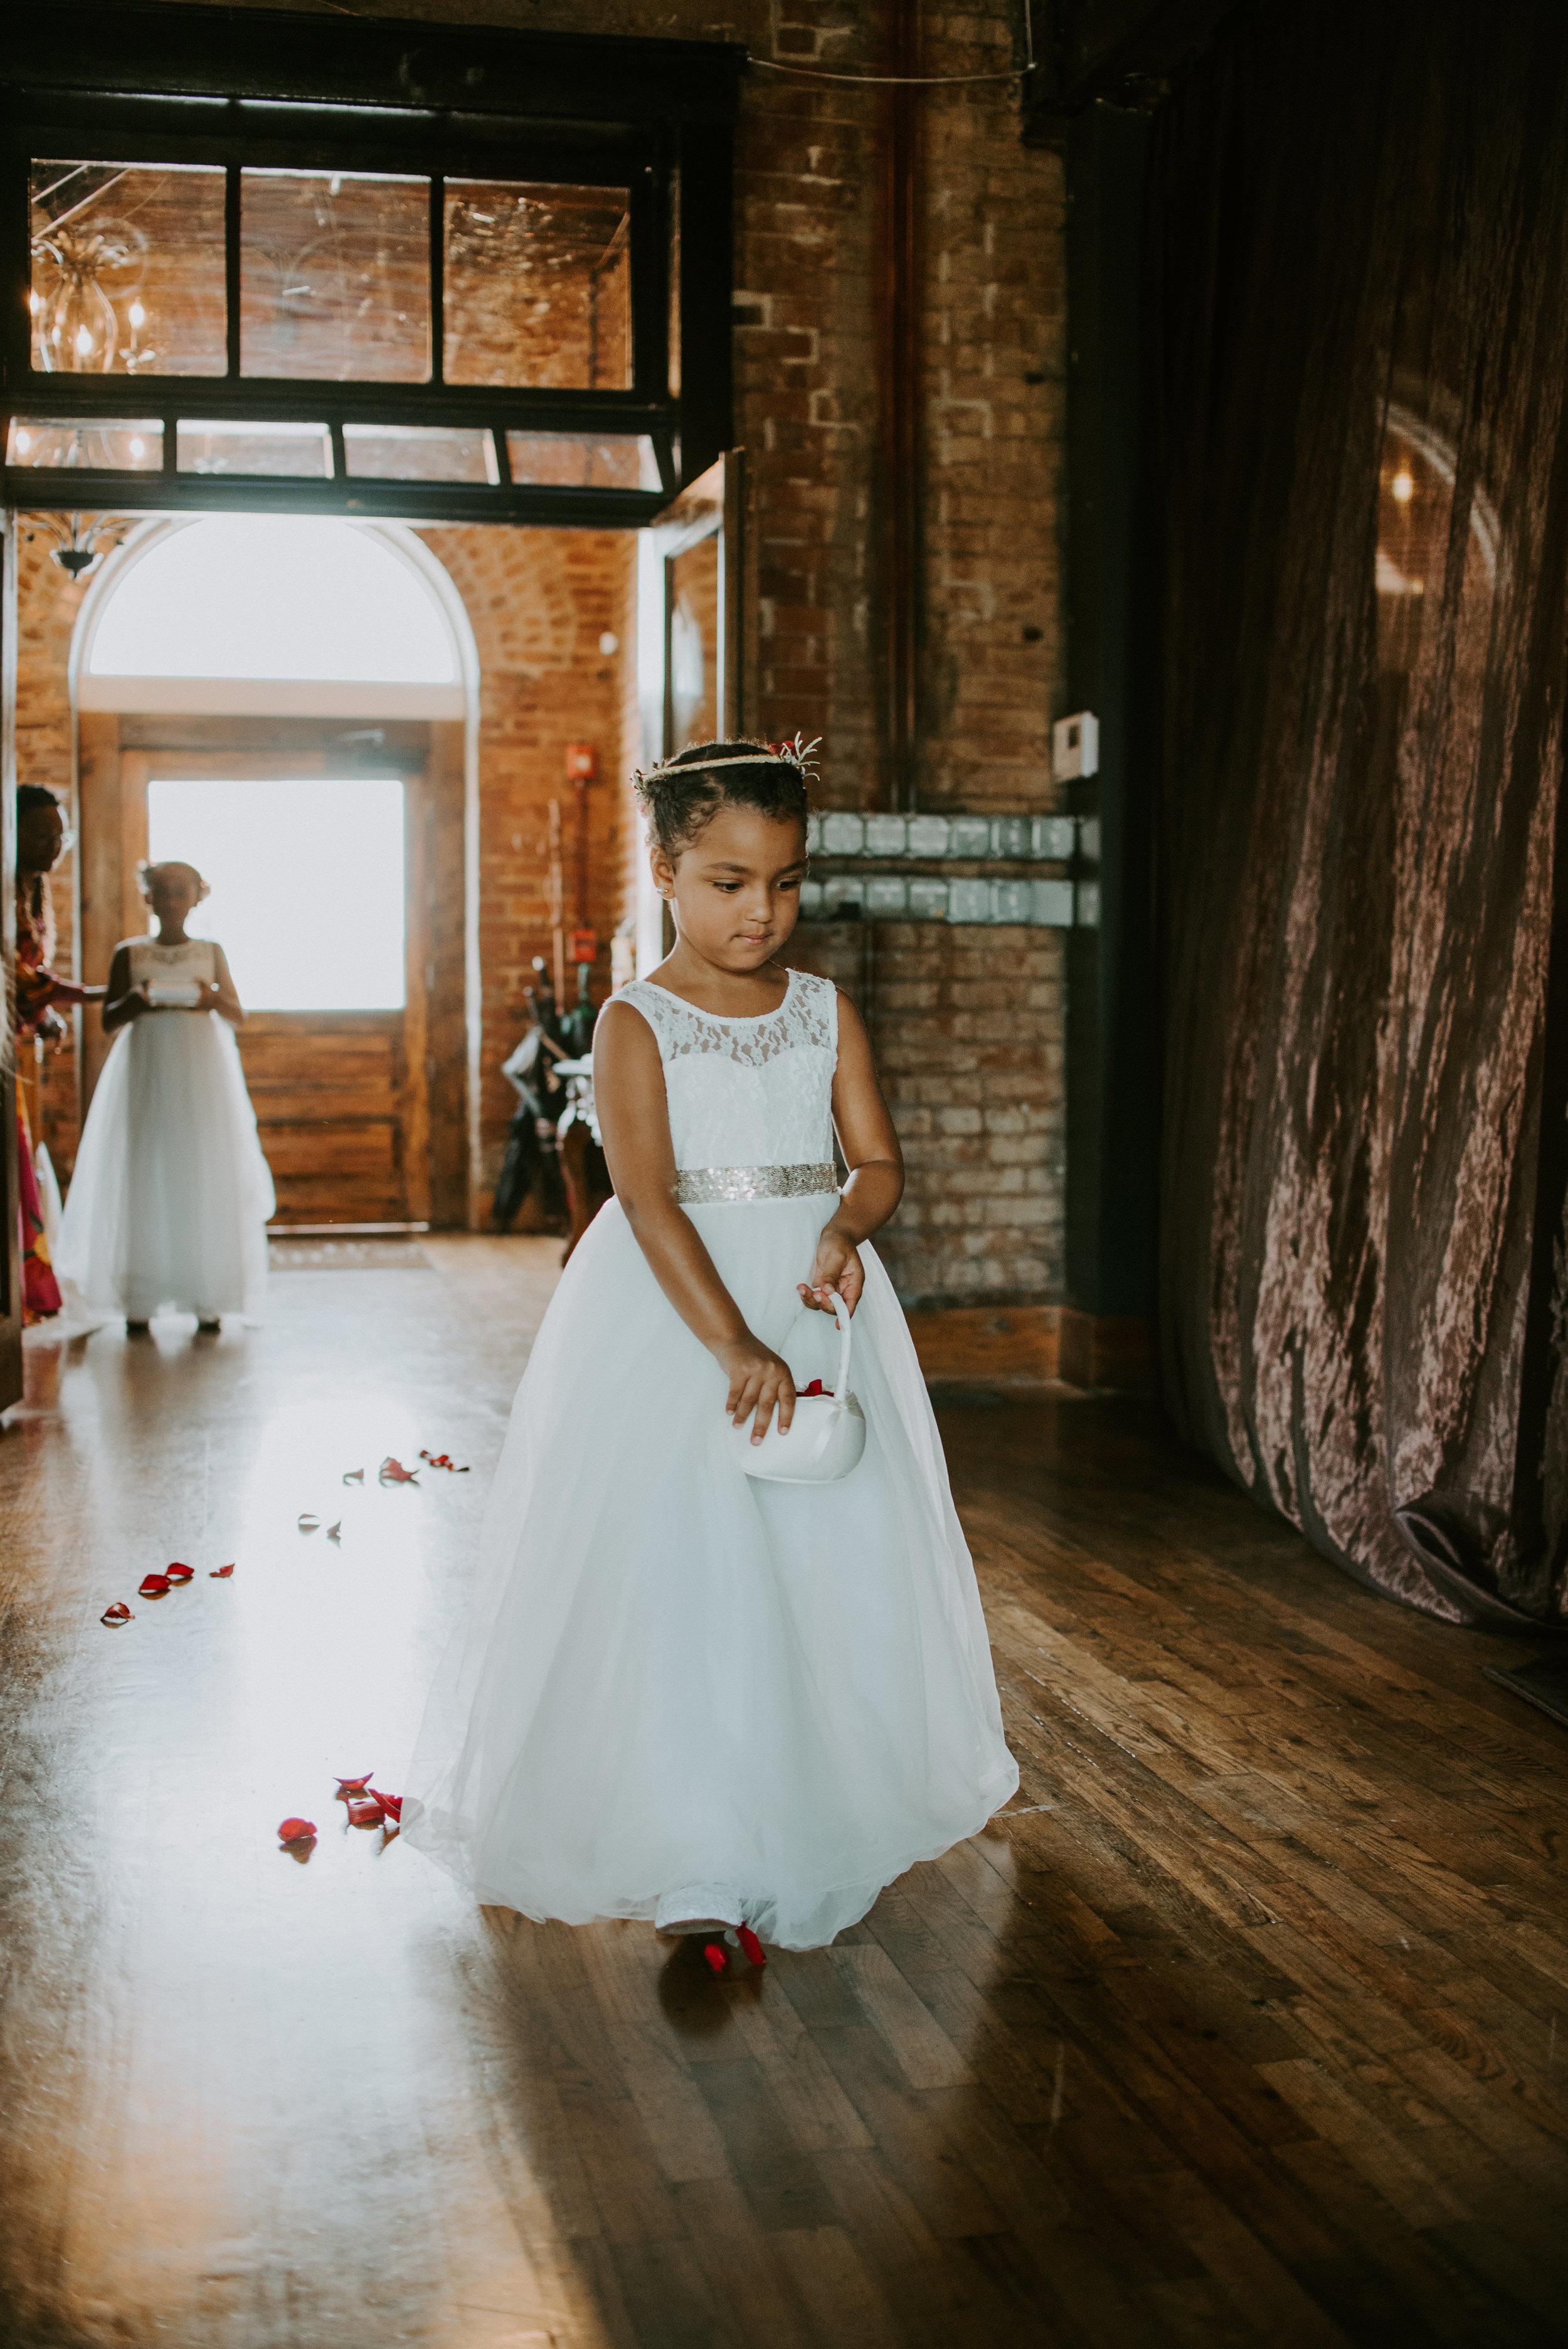 WonderlyCreative_Wedding_6.7.18_Khara&Dwayne_-451.jpg